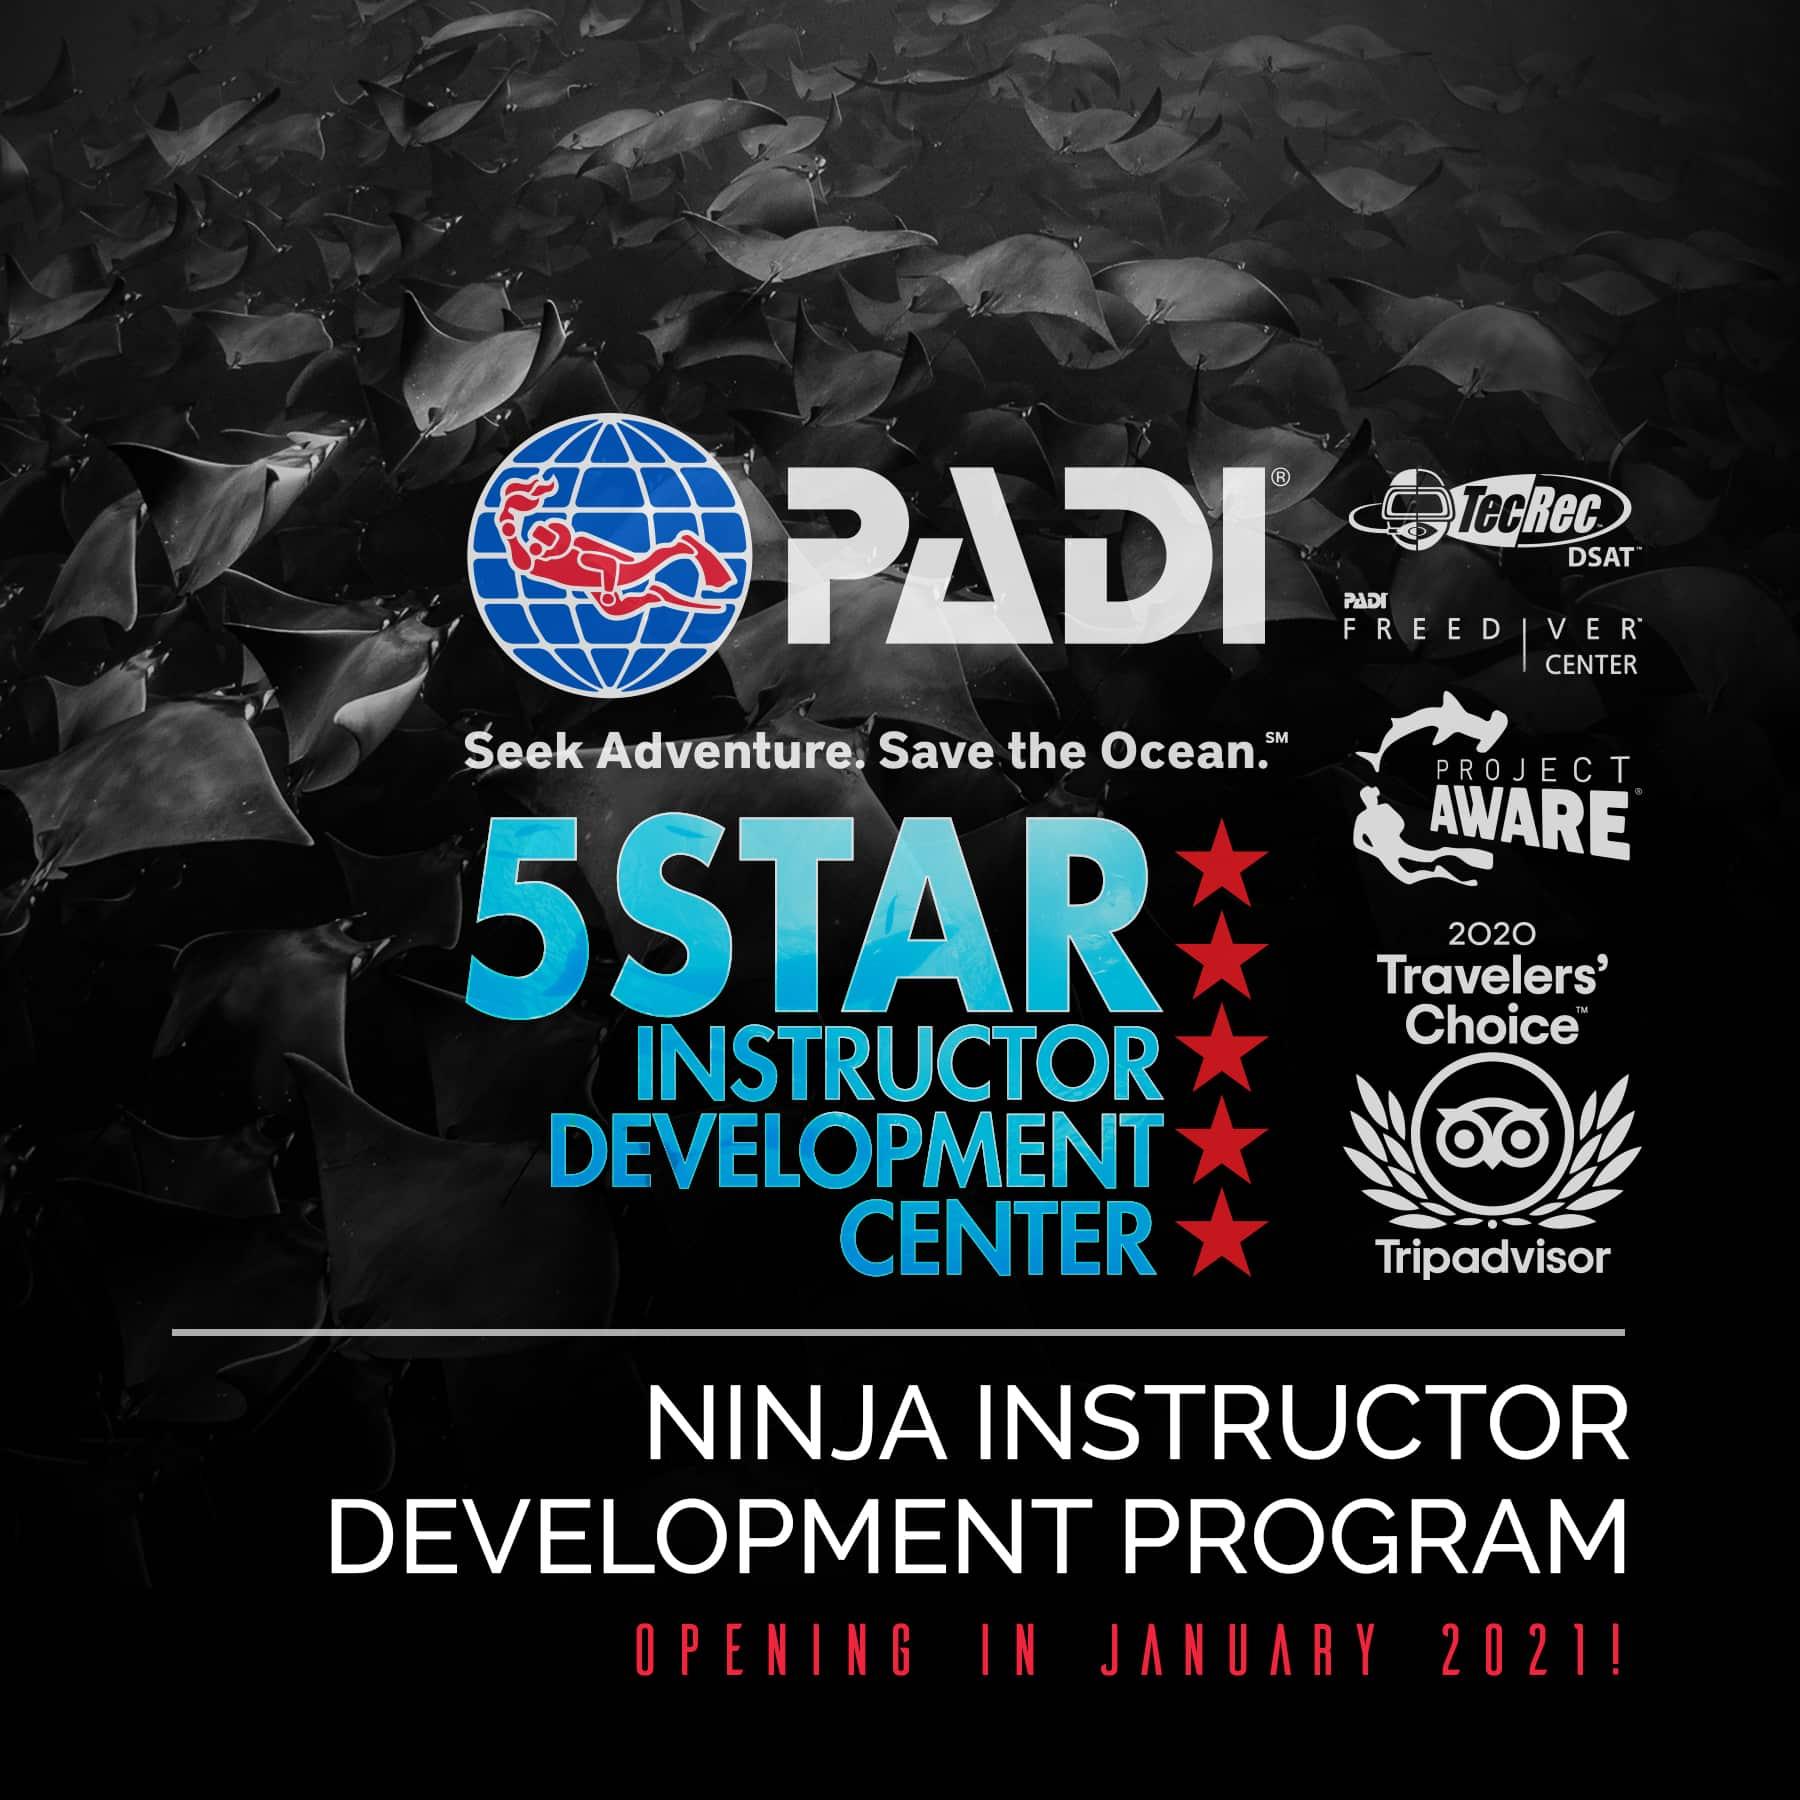 Ninja PADI Instructor Development Course IDC in Los Cabos, Mexico